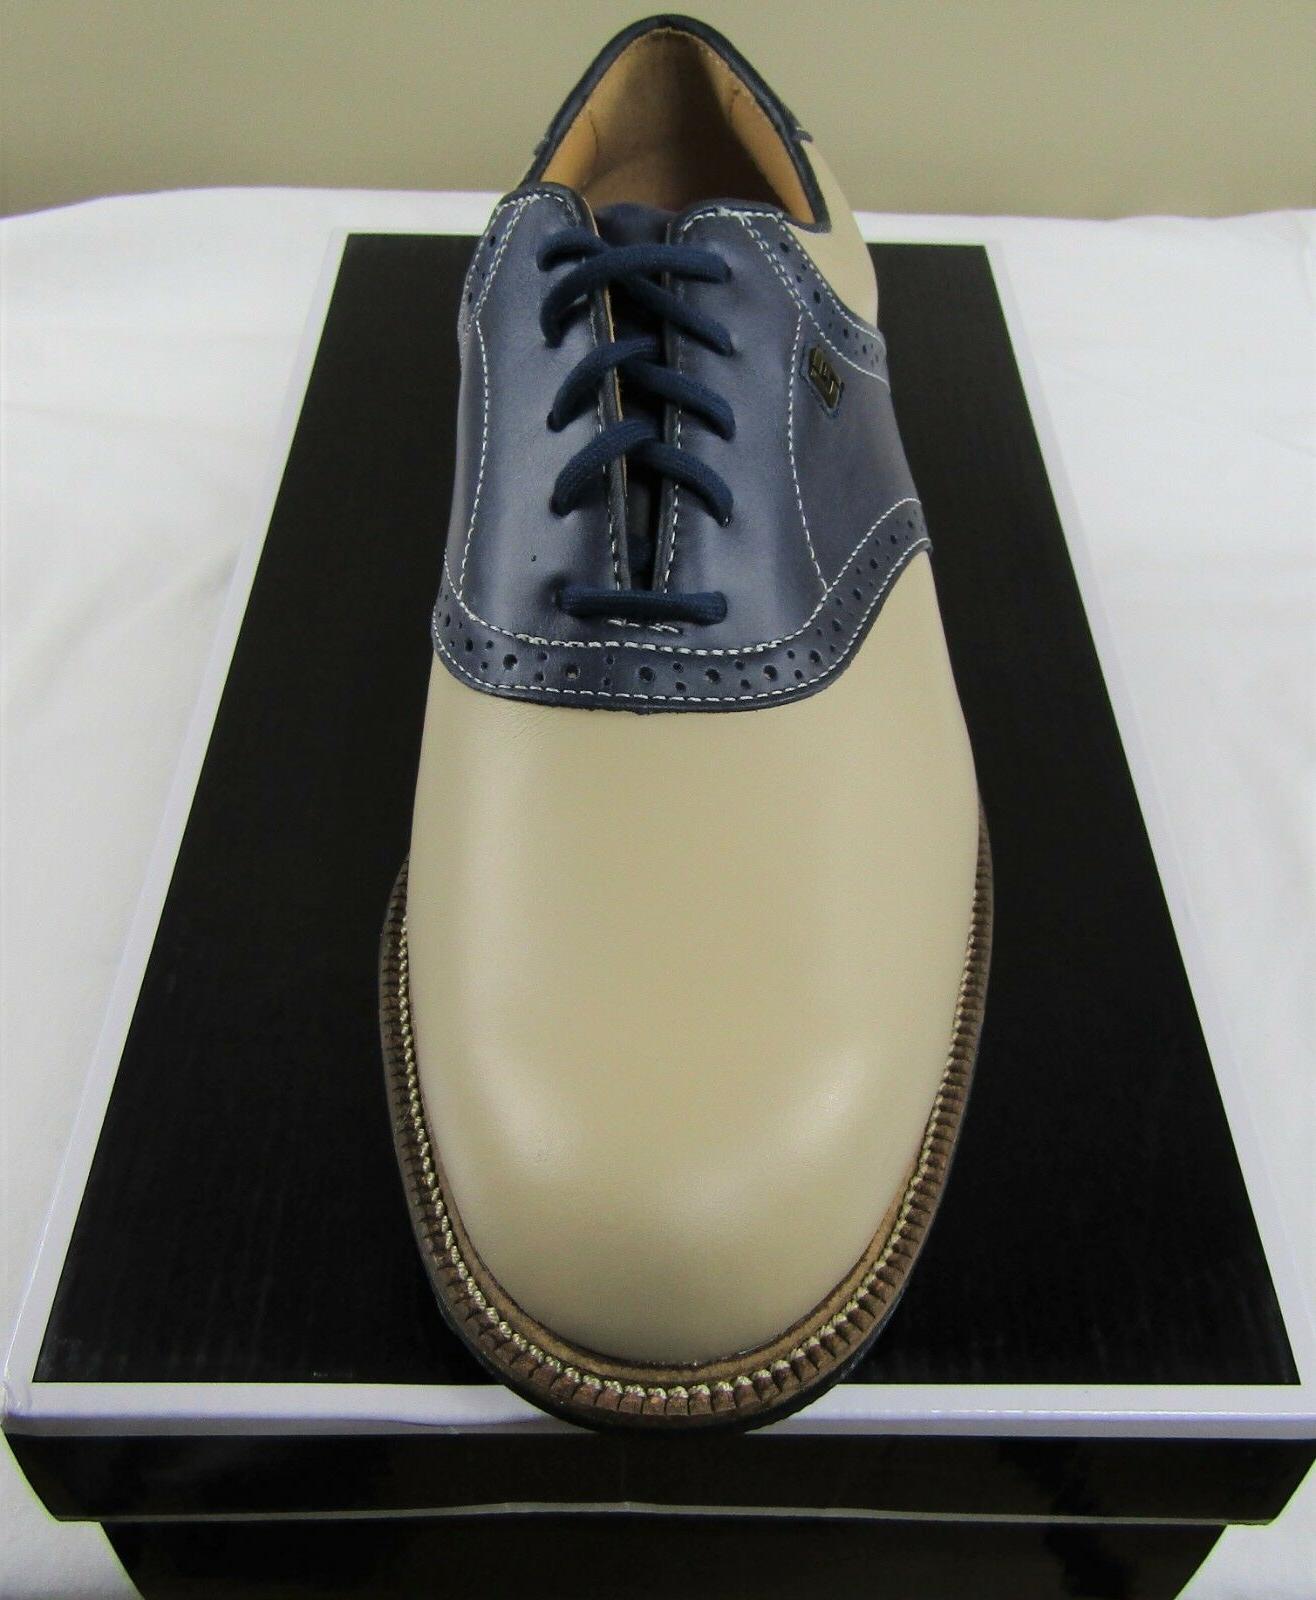 New in Box Club Shoes, Bone 57004